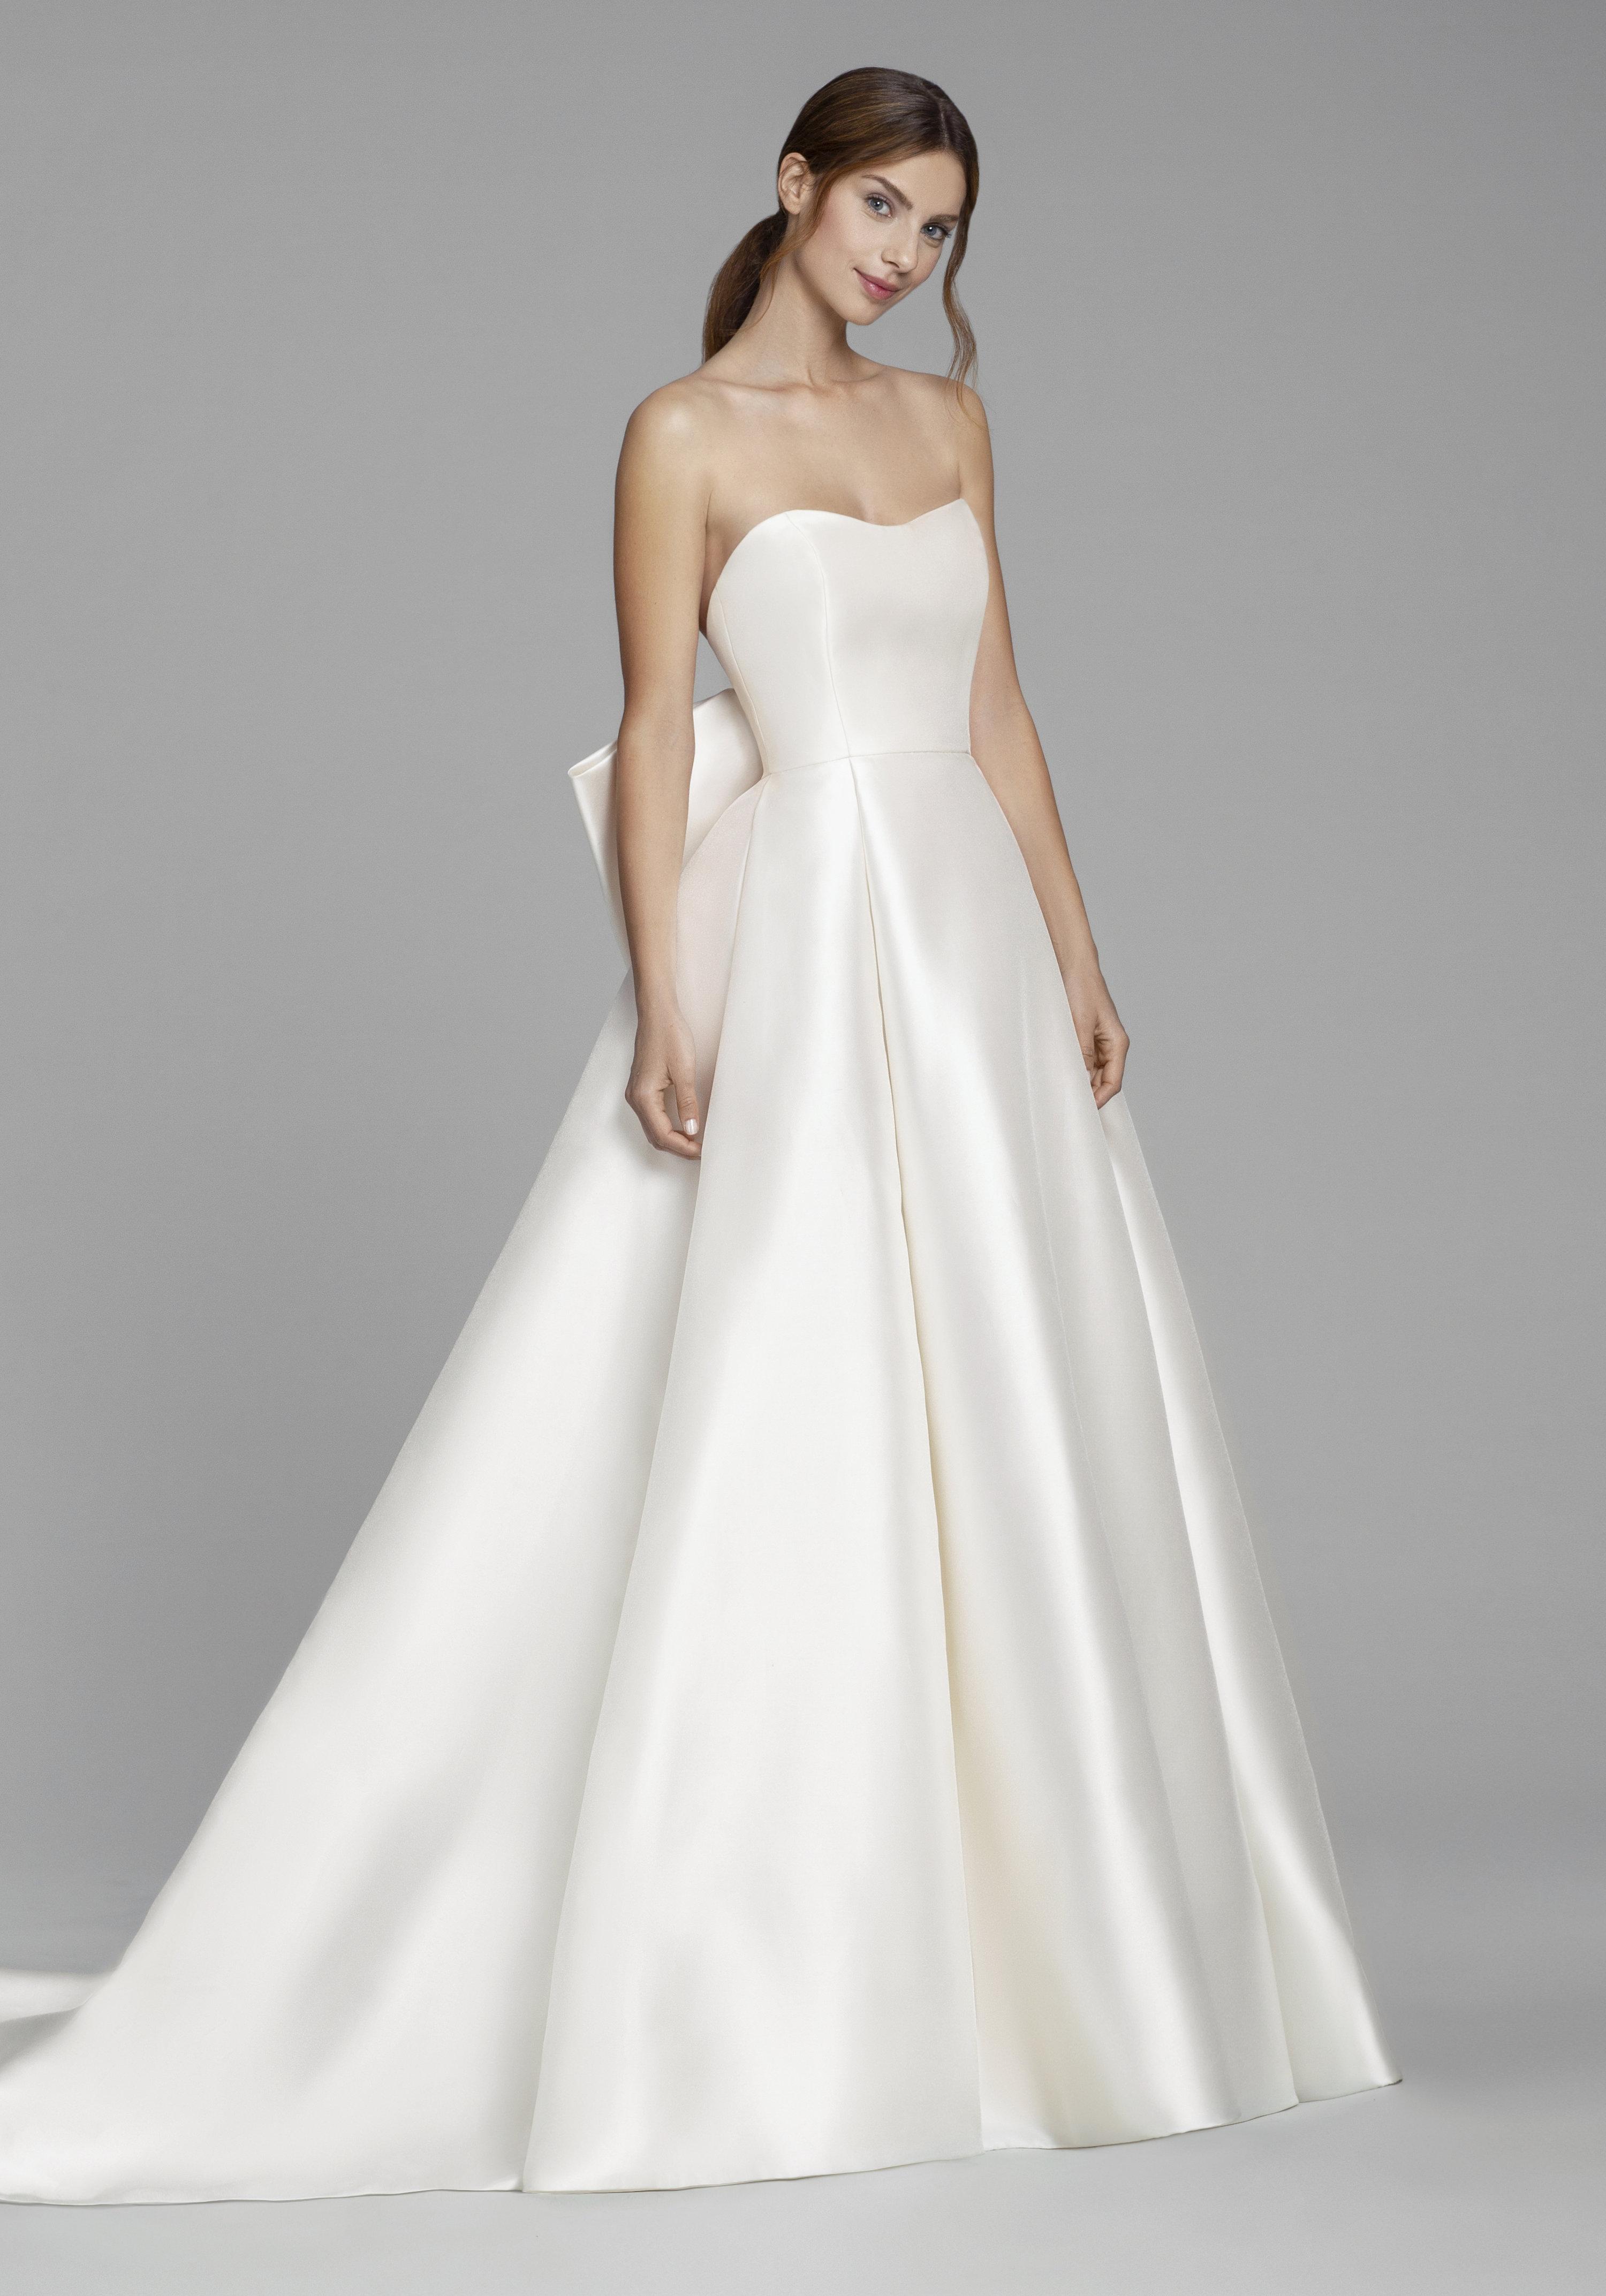 Tara Keely Lace Wedding Dress Ball Gown